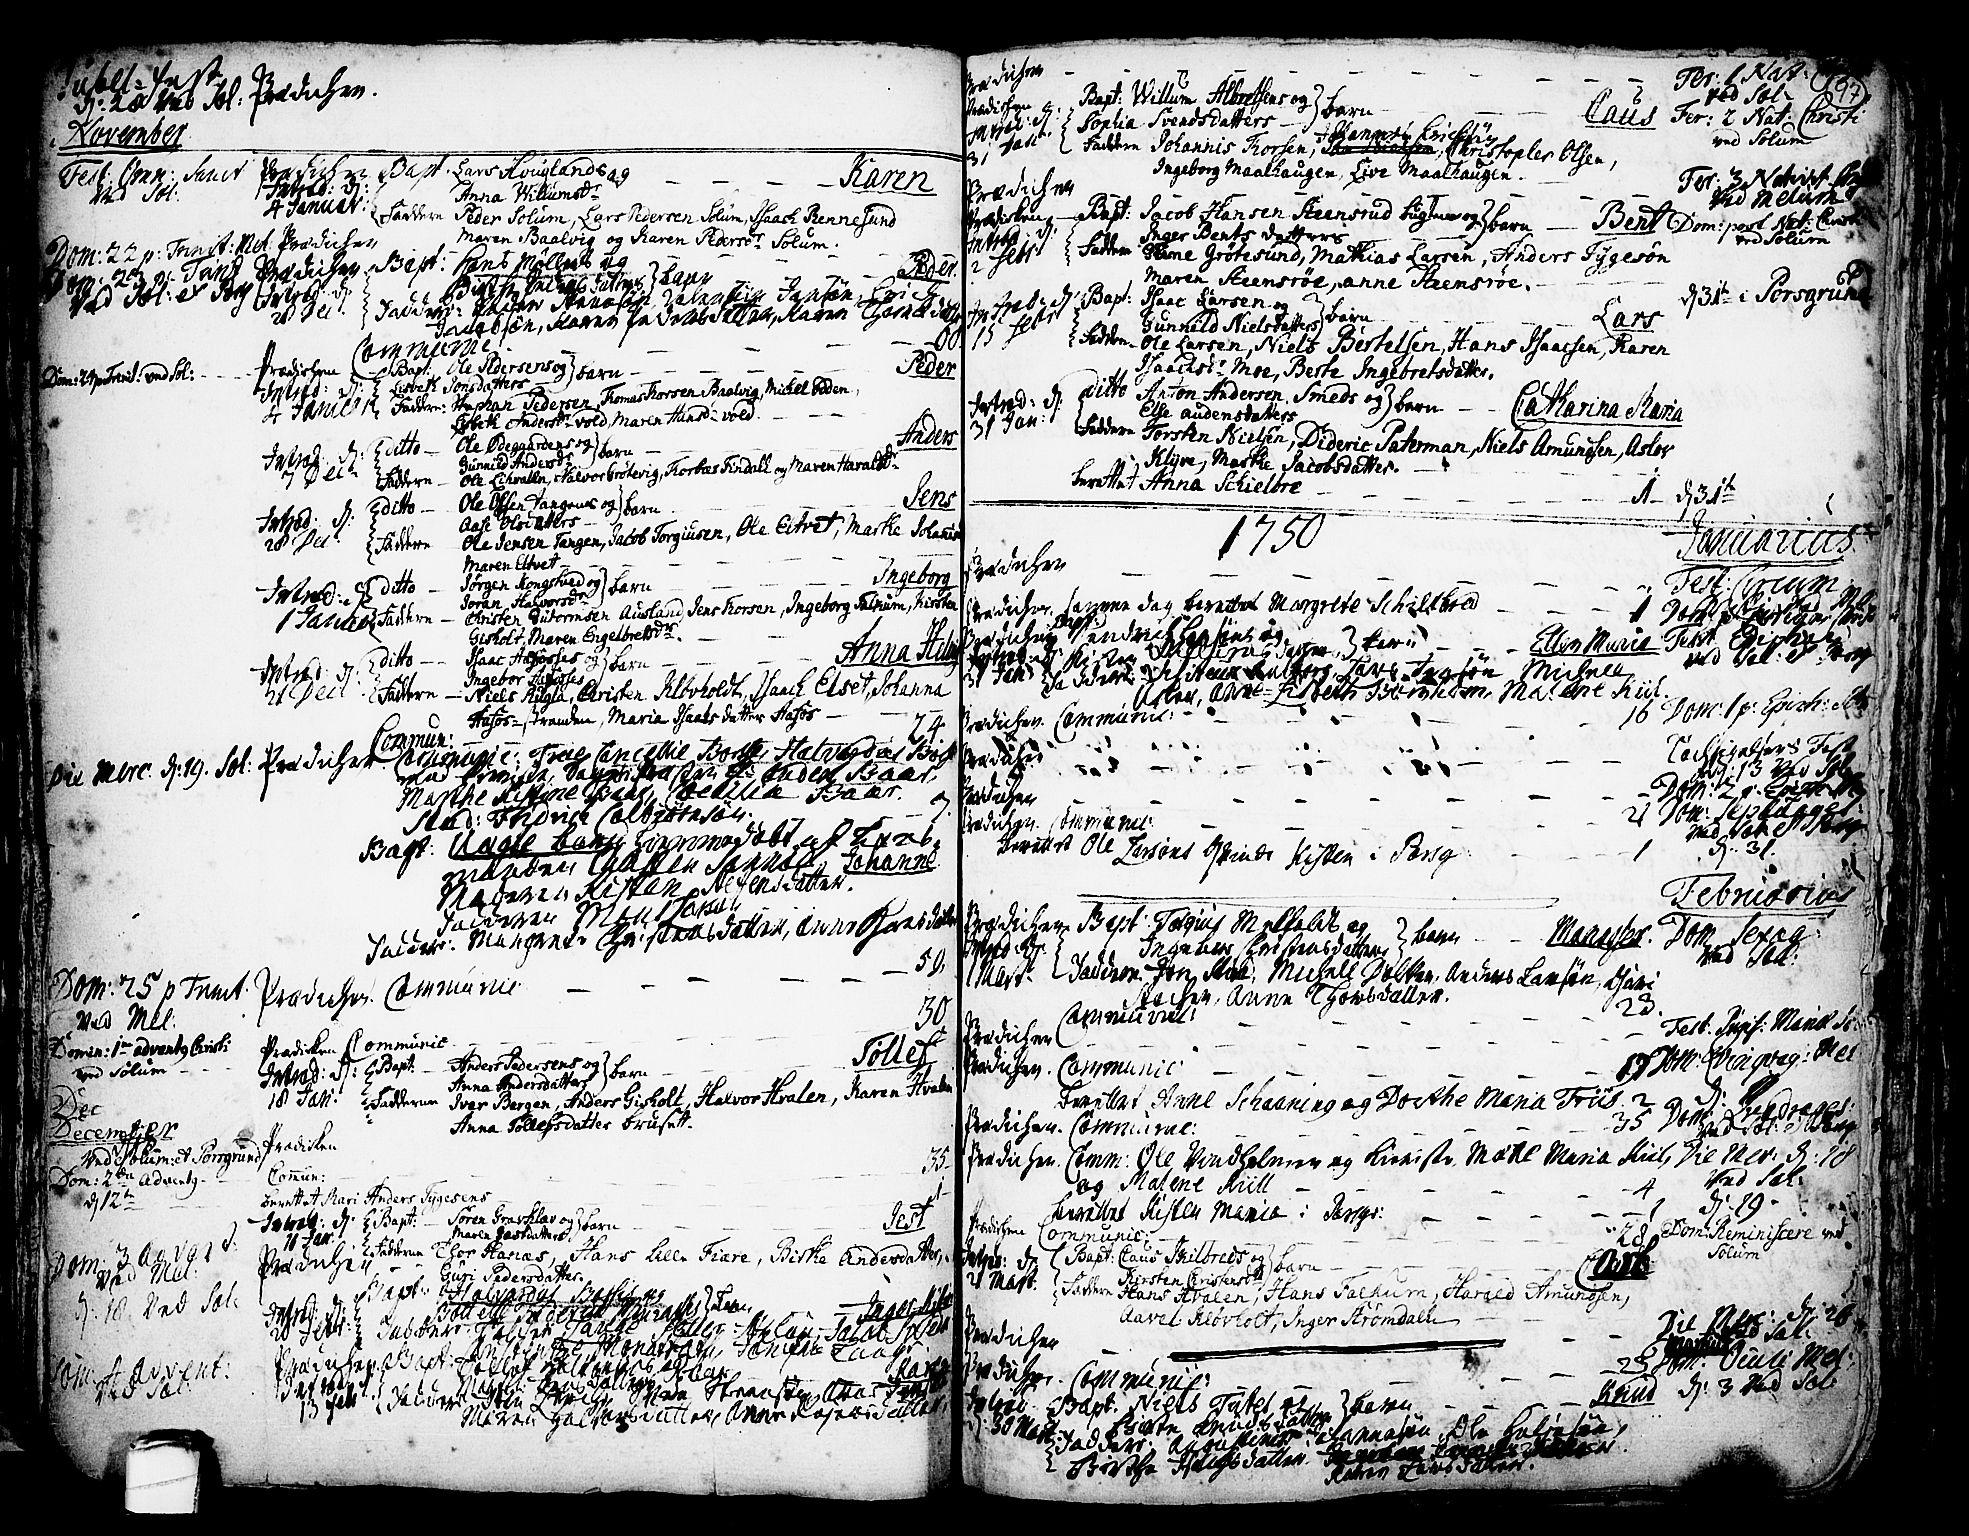 SAKO, Solum kirkebøker, F/Fa/L0002: Ministerialbok nr. I 2, 1713-1761, s. 97